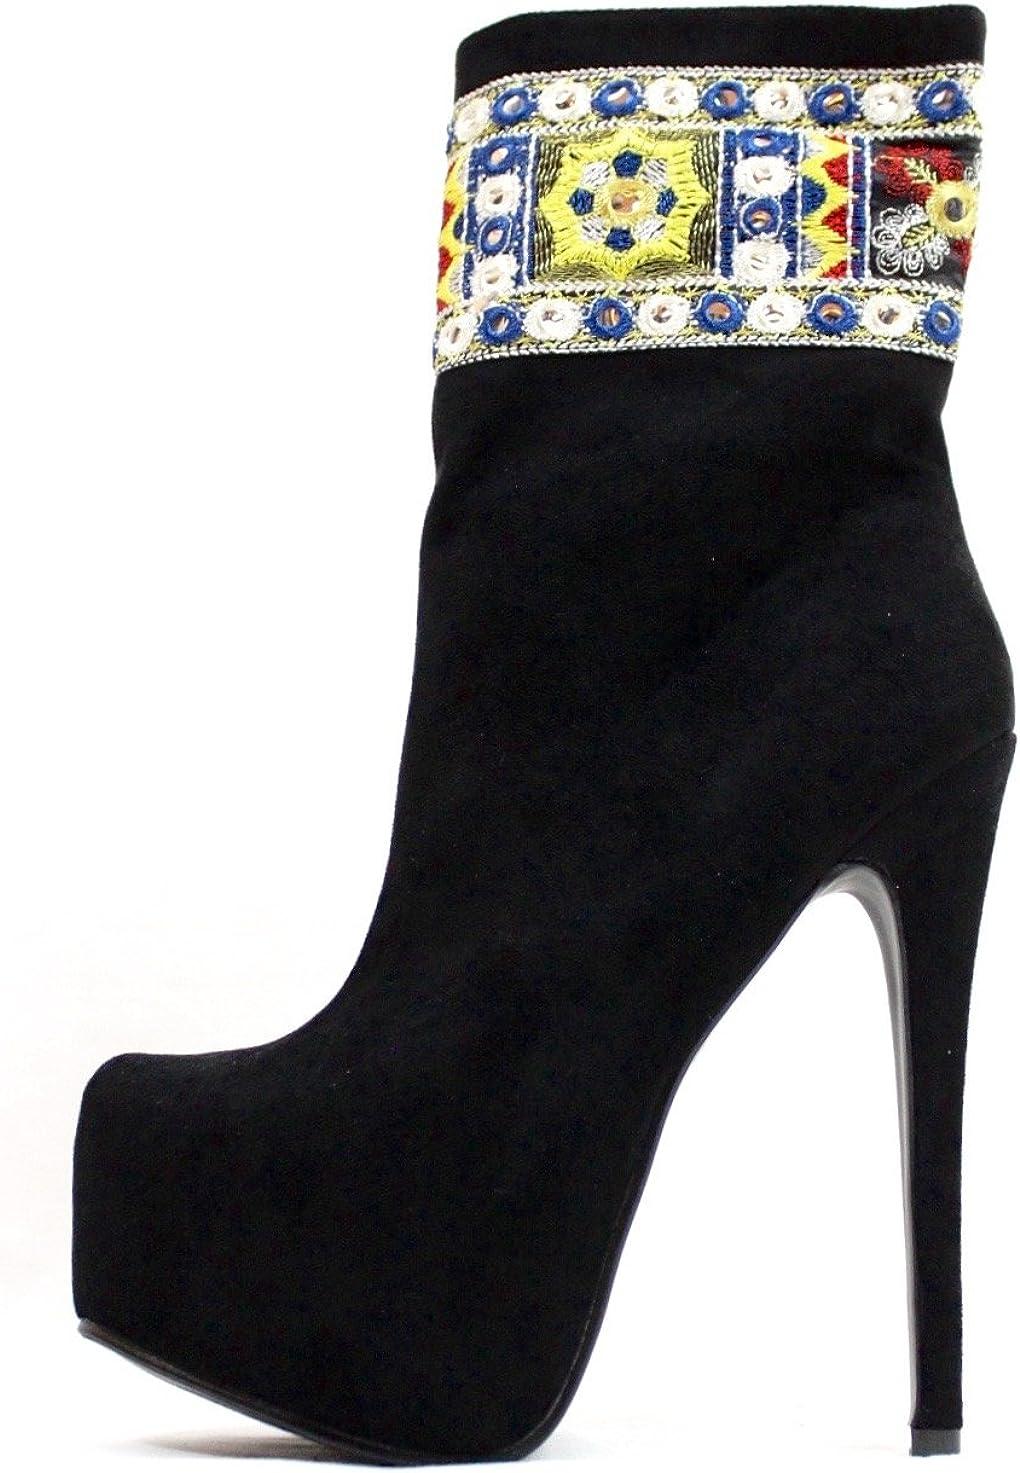 Athena Embellished Pointy Toe Platform High Heel Stiletto Mid Calf Dress Boots Bootie